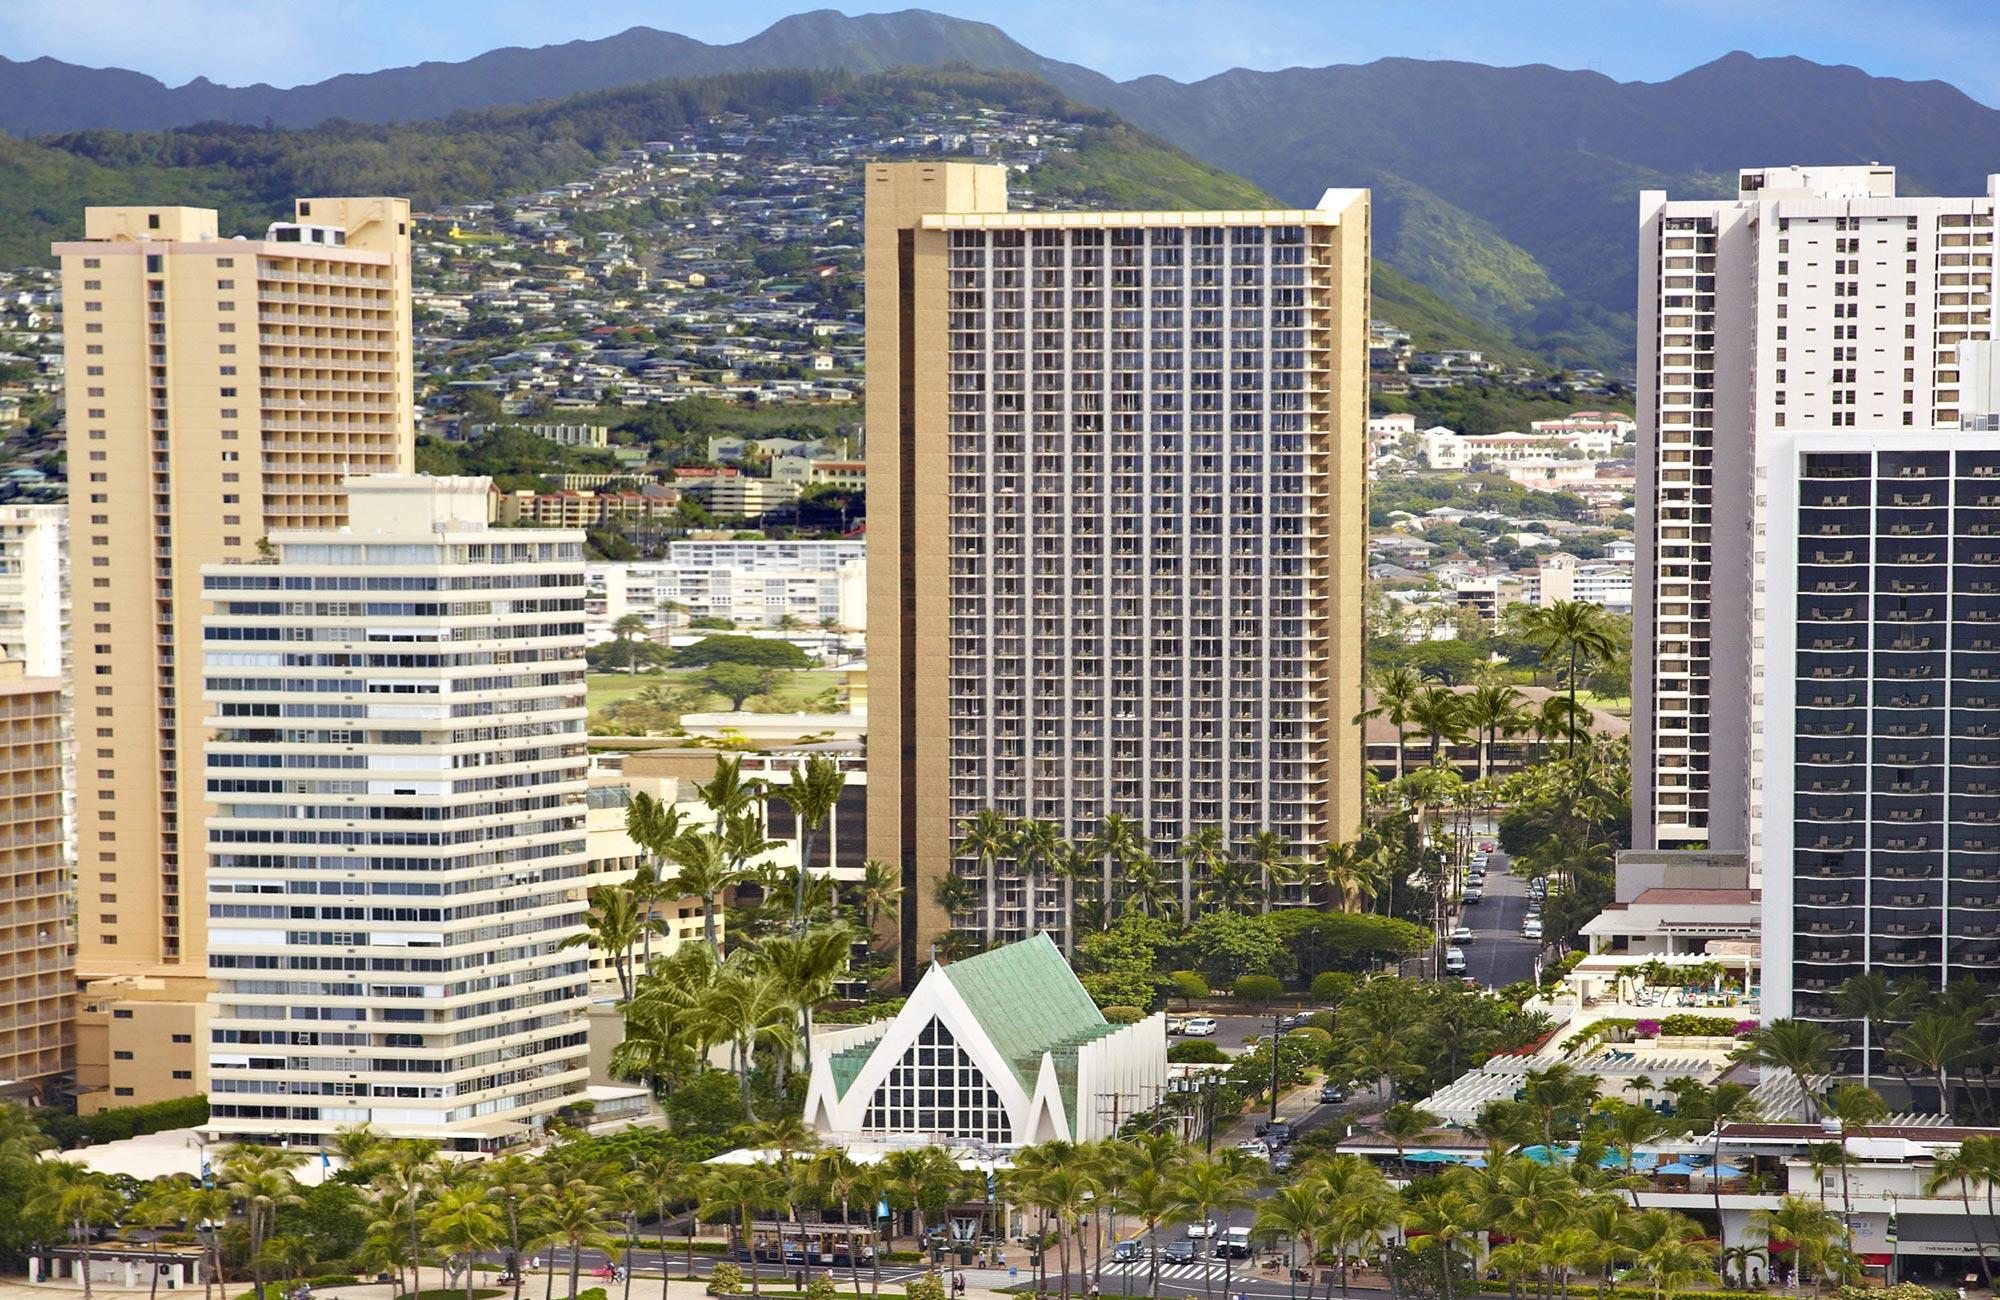 Hilton Waikiki Beach Prince Kuhio Hotel